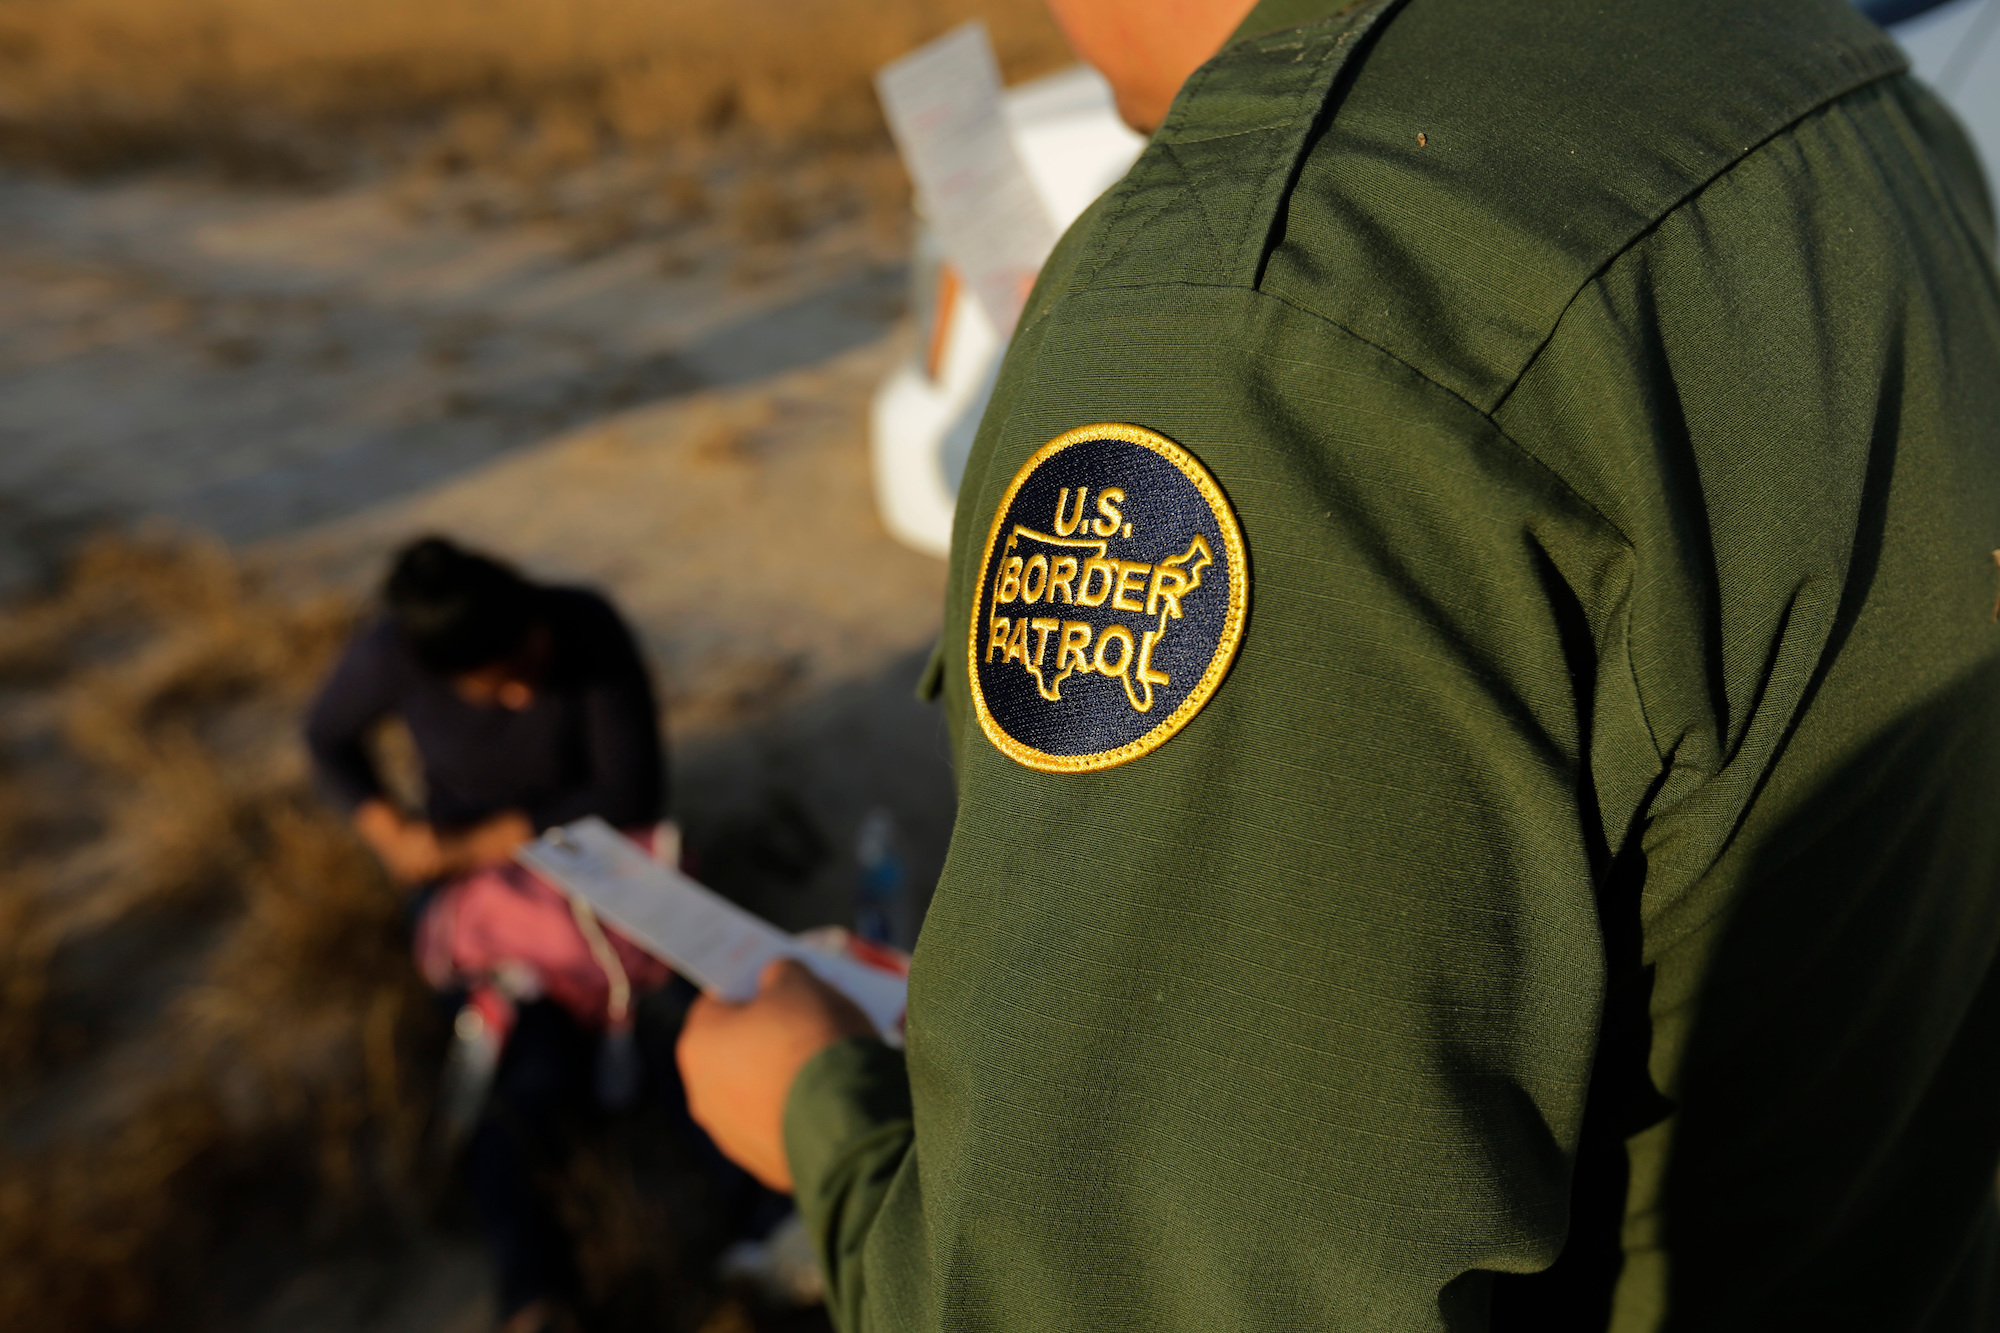 Trump Is Sending Elite Border Patrol Units to Make Arrests in Sanctuary Cities